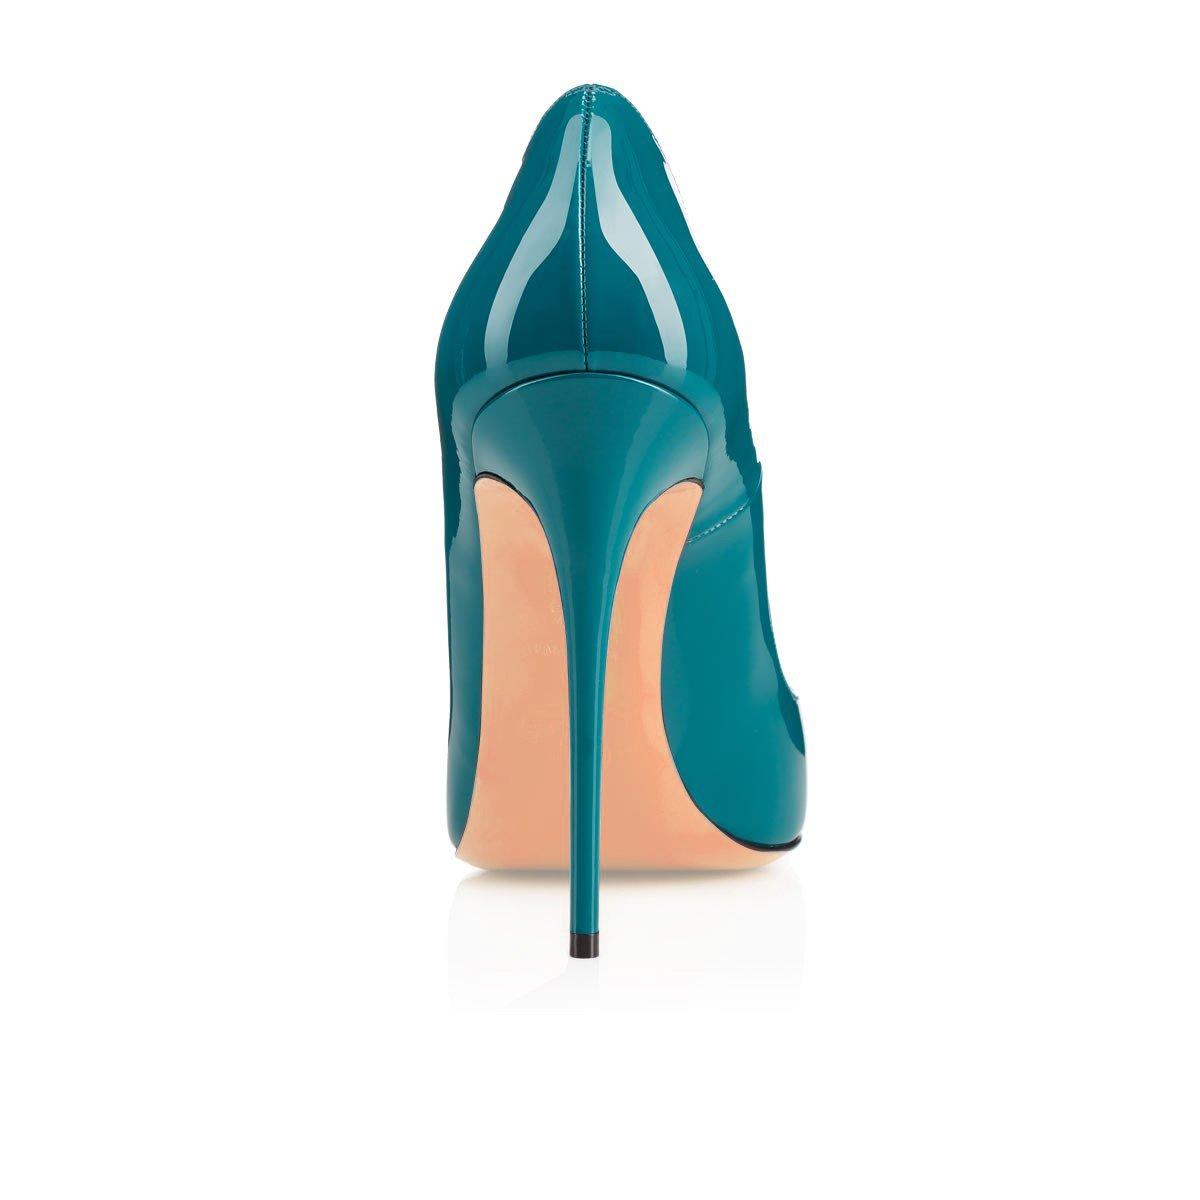 Eldof Womens High Heel Pumps Classic 4.72in Slip On Patent Pointed Toe Stilettos 12cm Wedding Party Dress Pumps